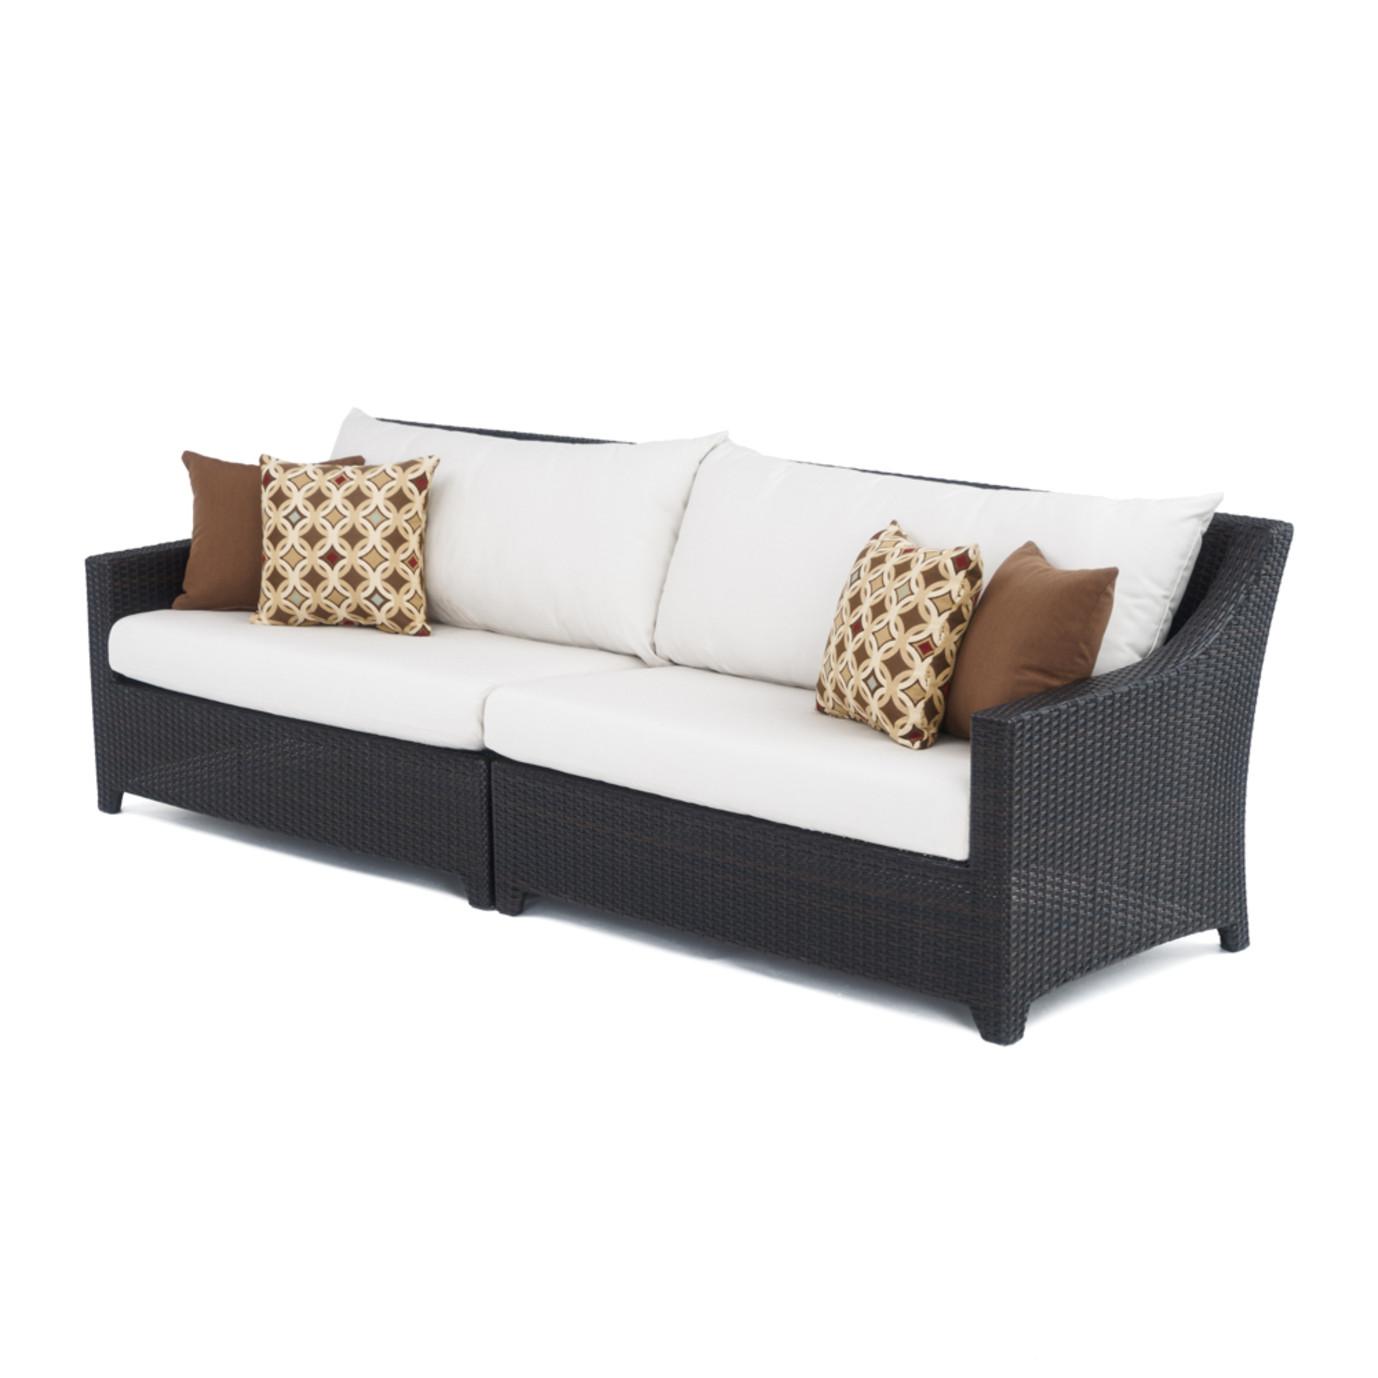 Mor Sofa Sofa Review 28 Images Furniture Interior Furniture Design By Robert Rst Brands Op